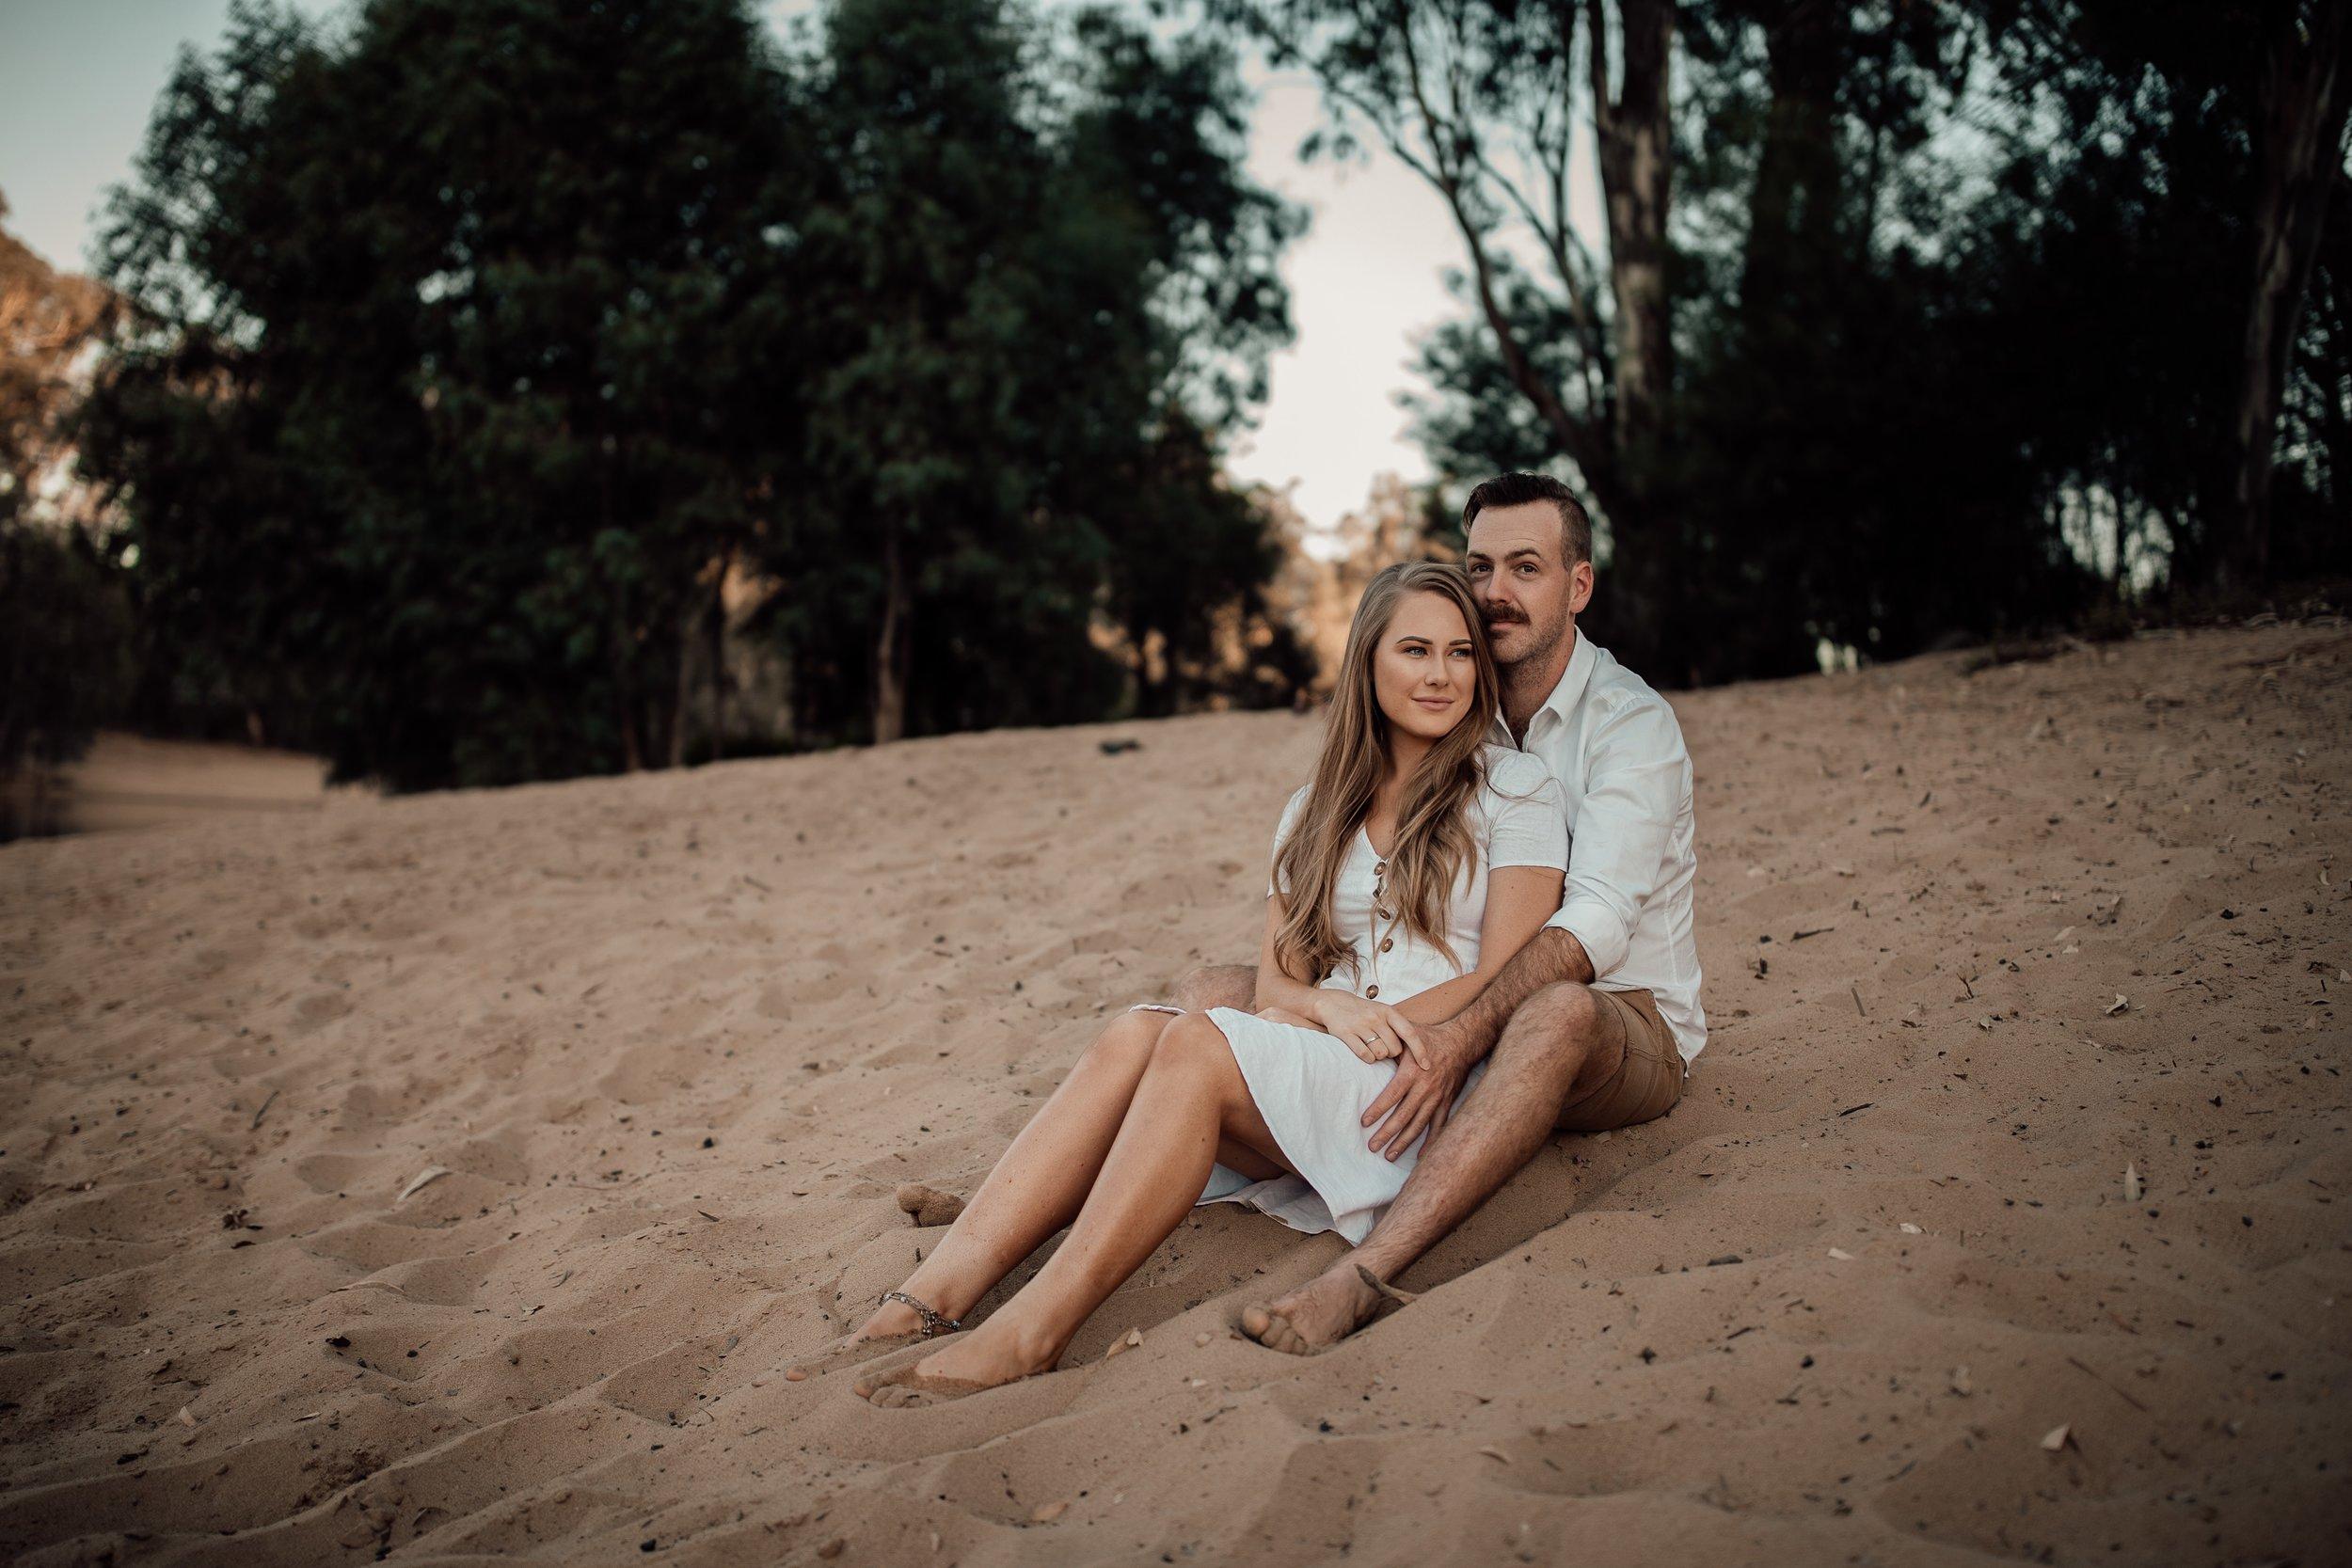 mickalathomas_puremacphotography_weddingphotographer_couplephotographer_Sheppartonphotographer_2859.jpg